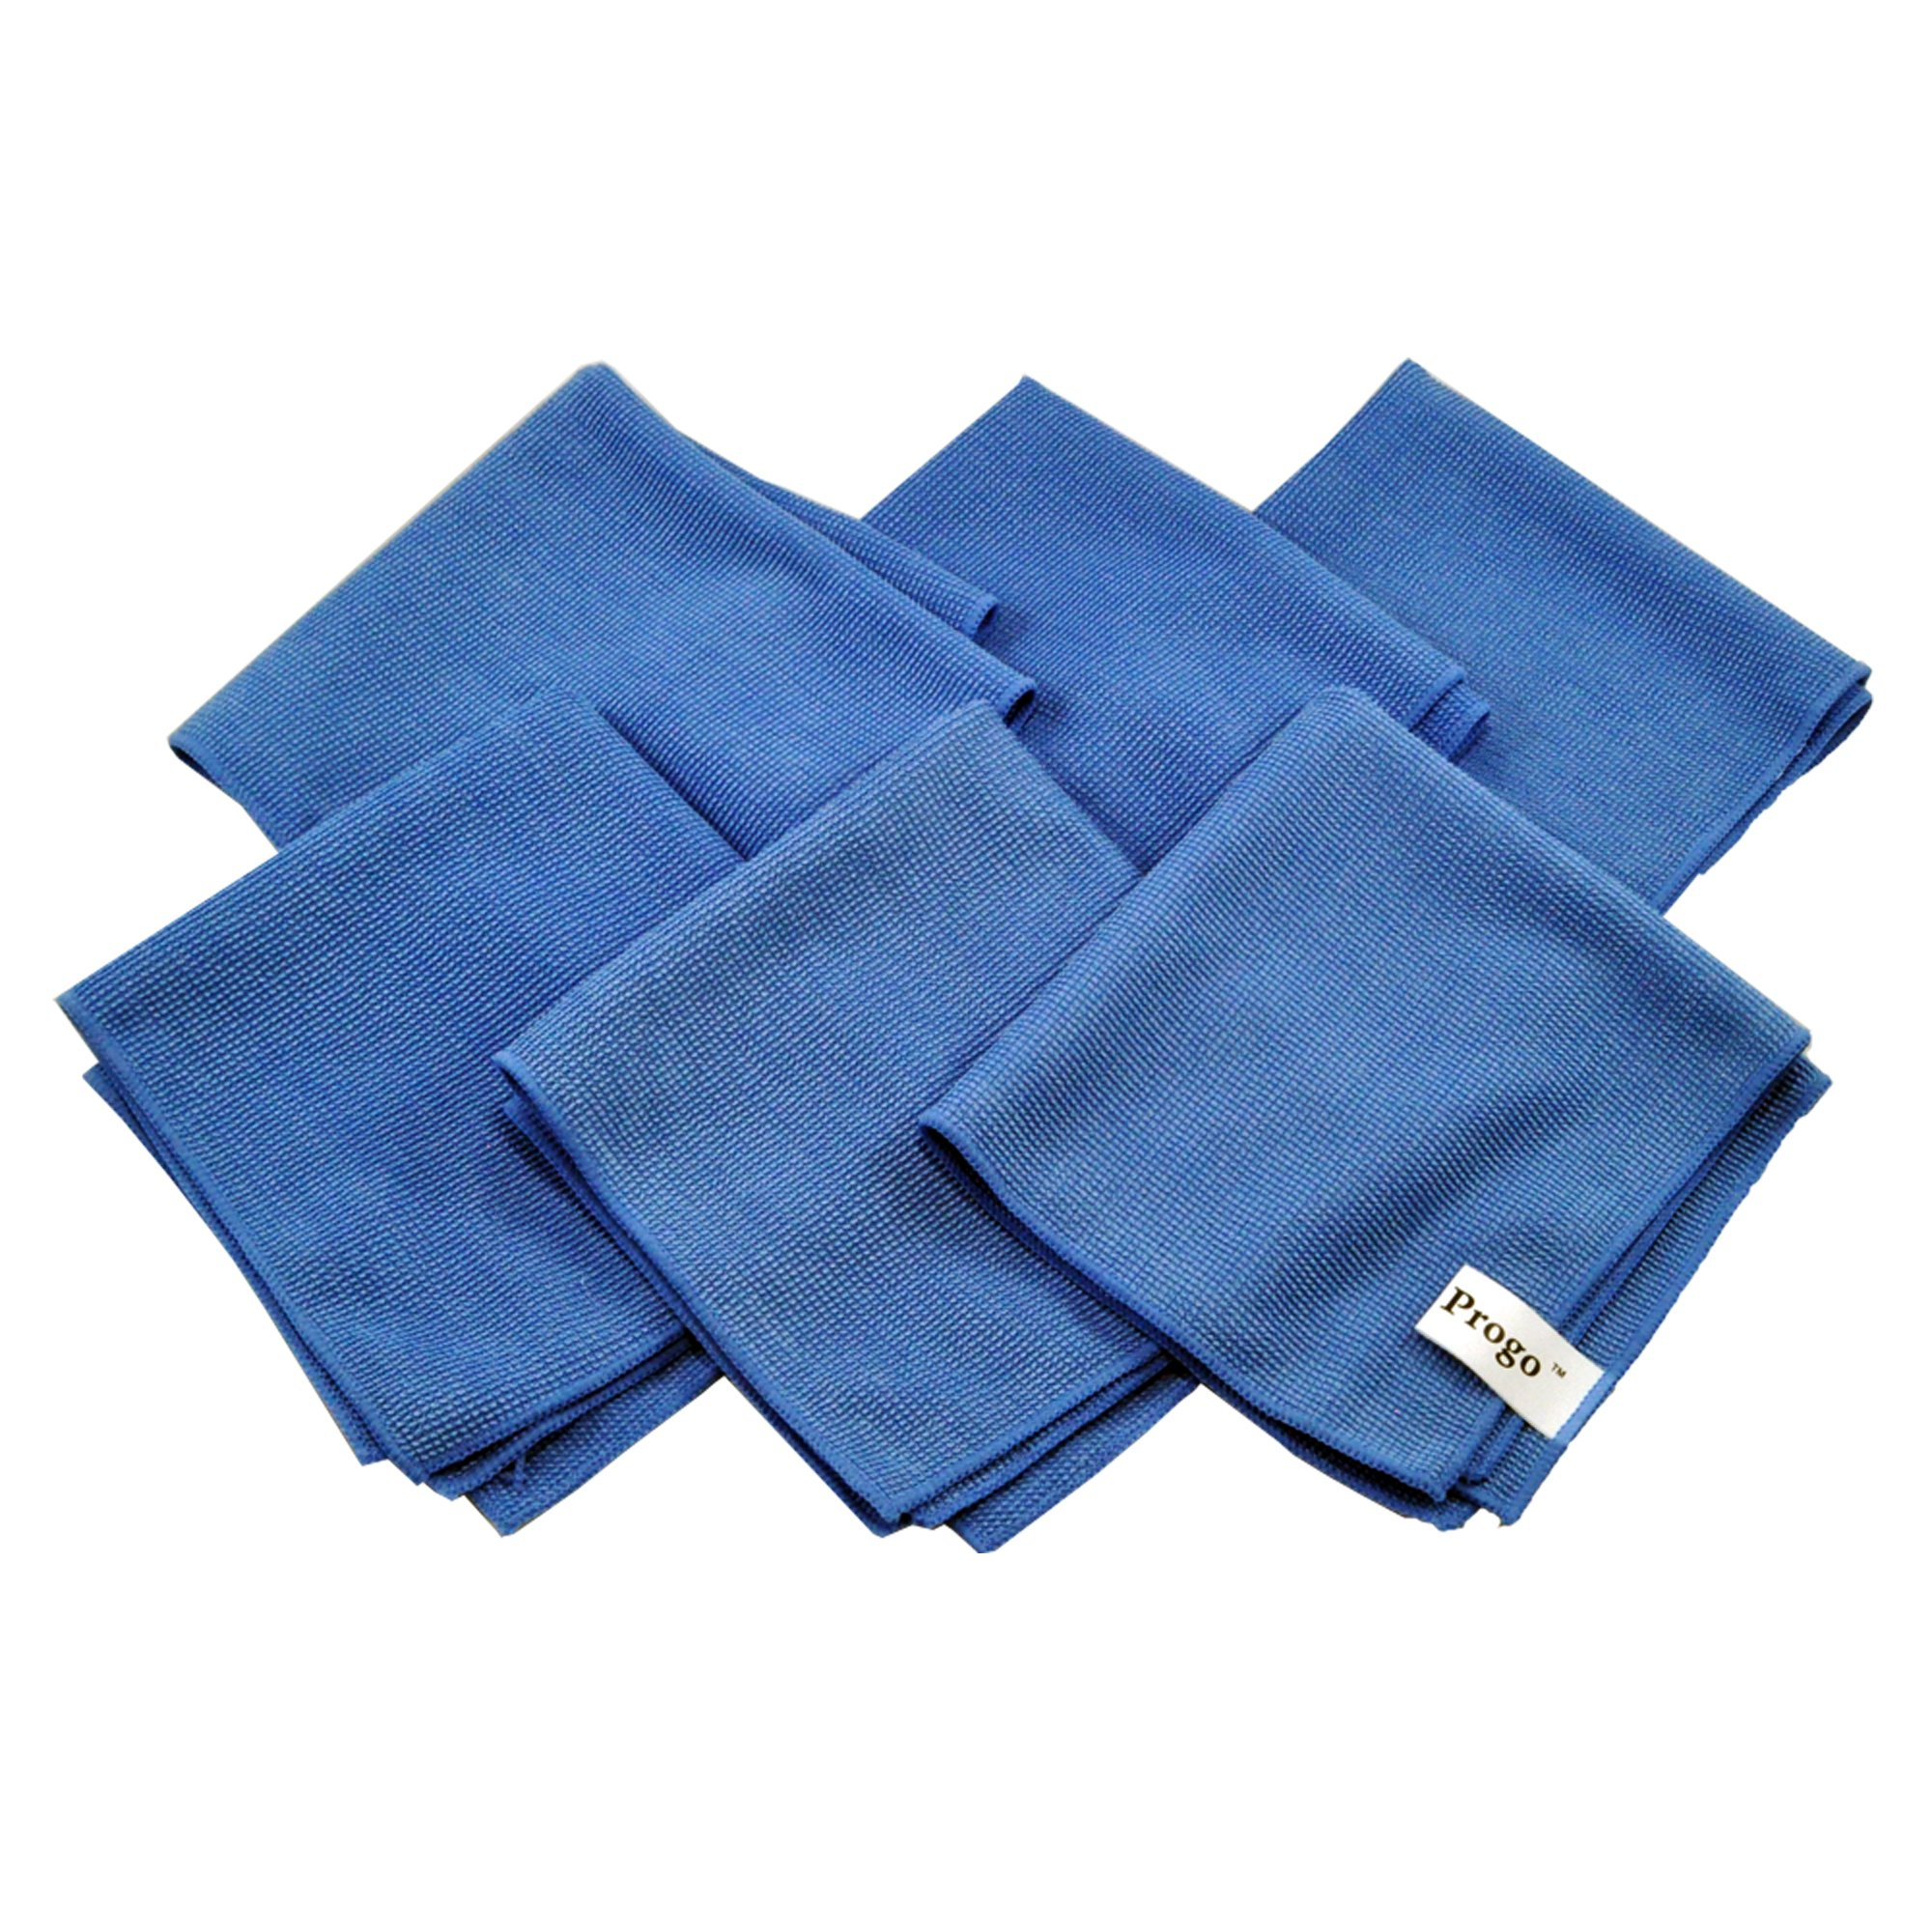 Microfiber Cloth Best: Best Microfiber Cloth For Screens